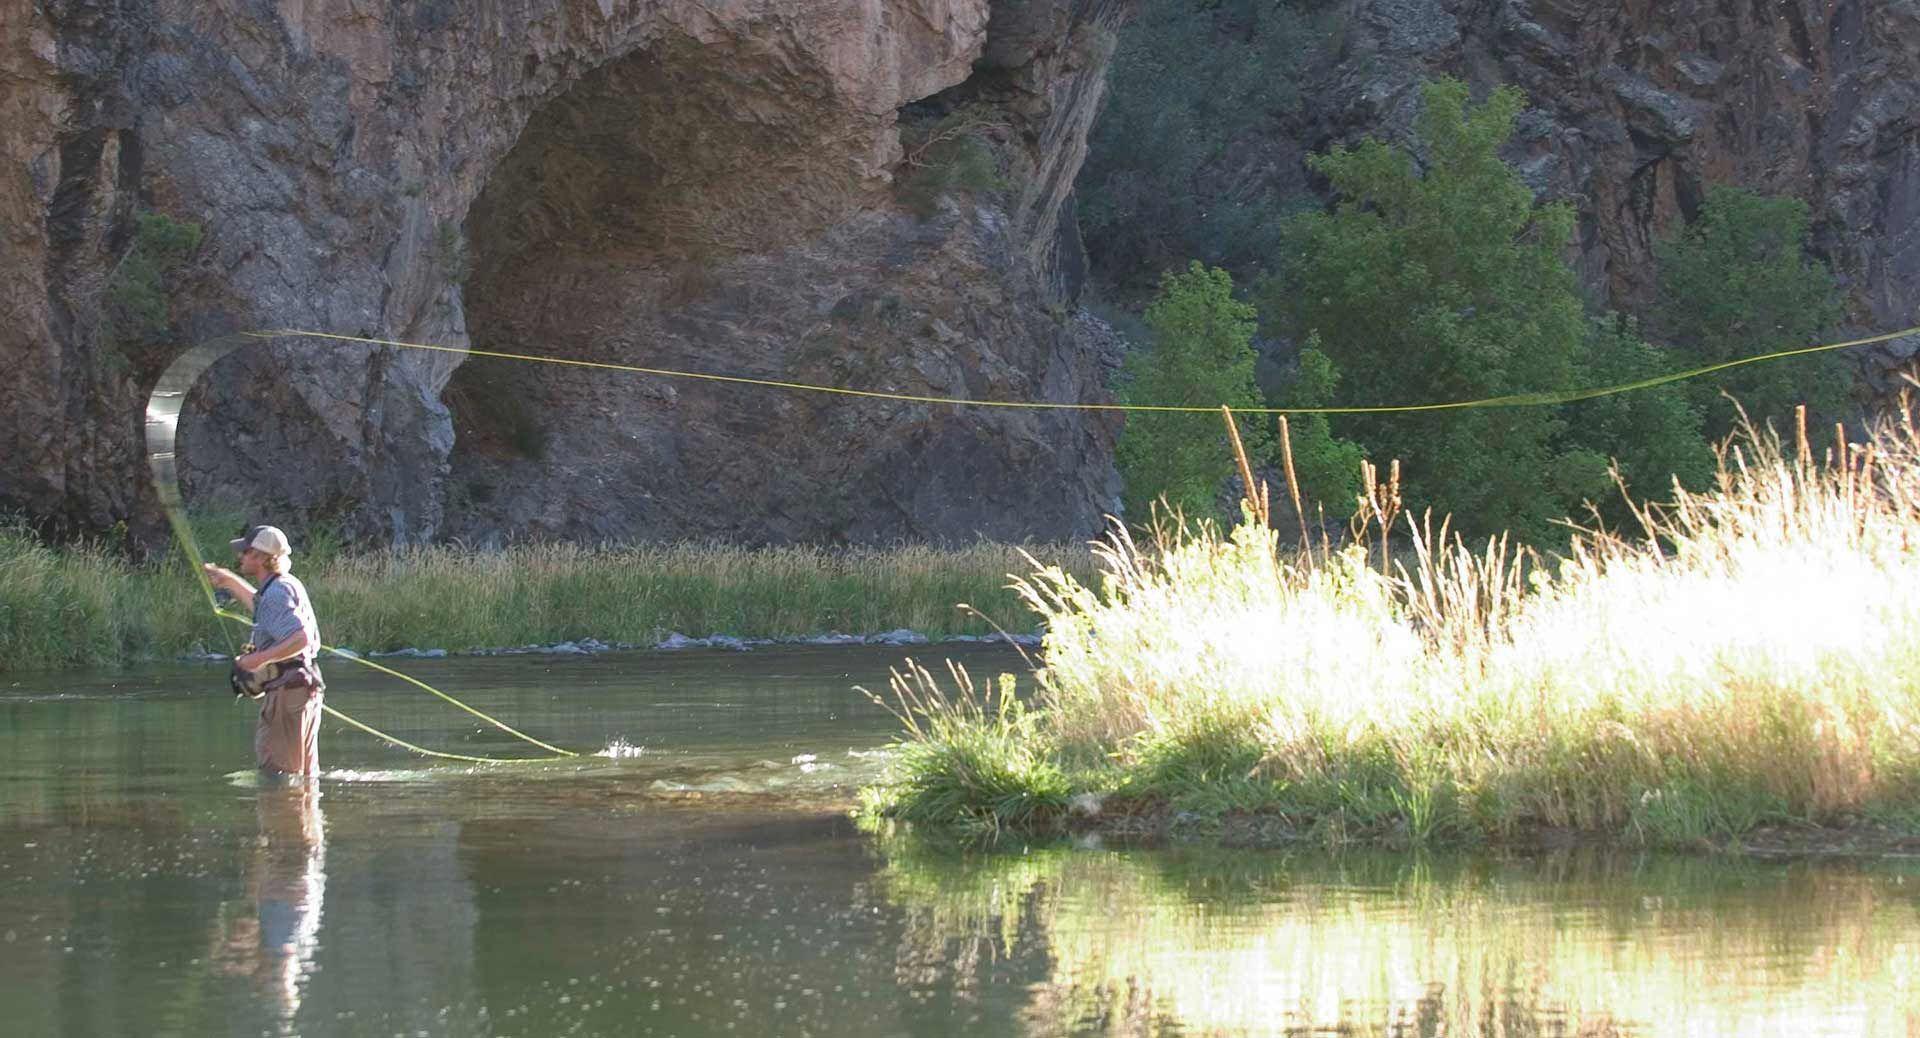 Dunton River Camp fly fishing